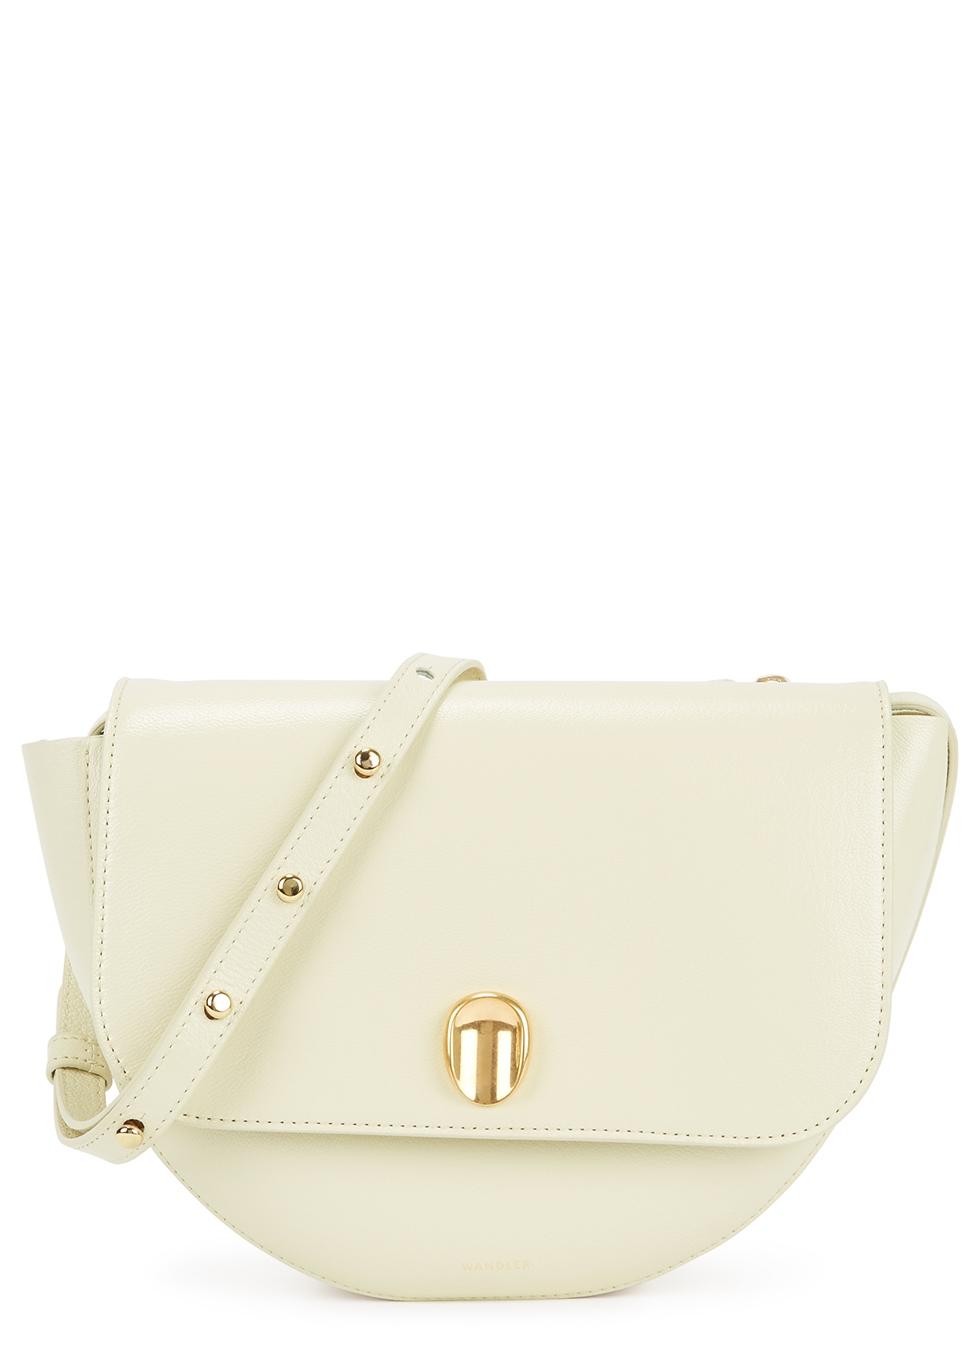 d885903905 Women's Designer Bags, Handbags and Purses - Harvey Nichols